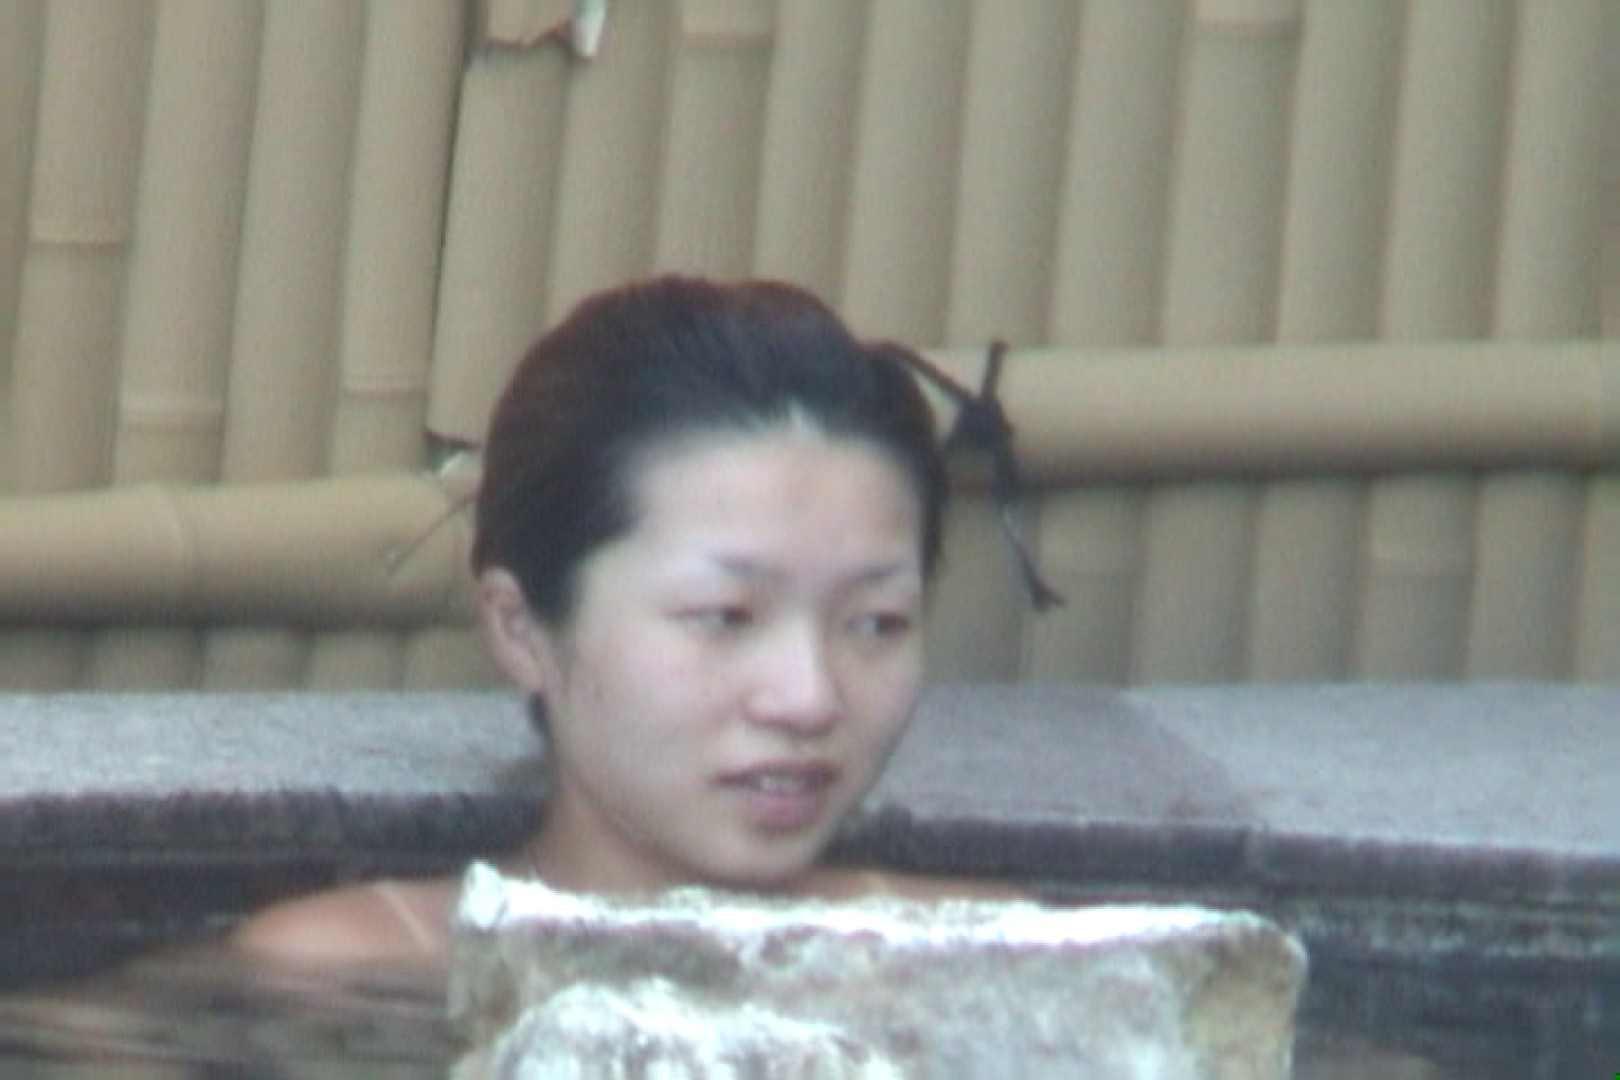 Aquaな露天風呂Vol.571 美しいOLの裸体 | 露天風呂突入  99pic 28